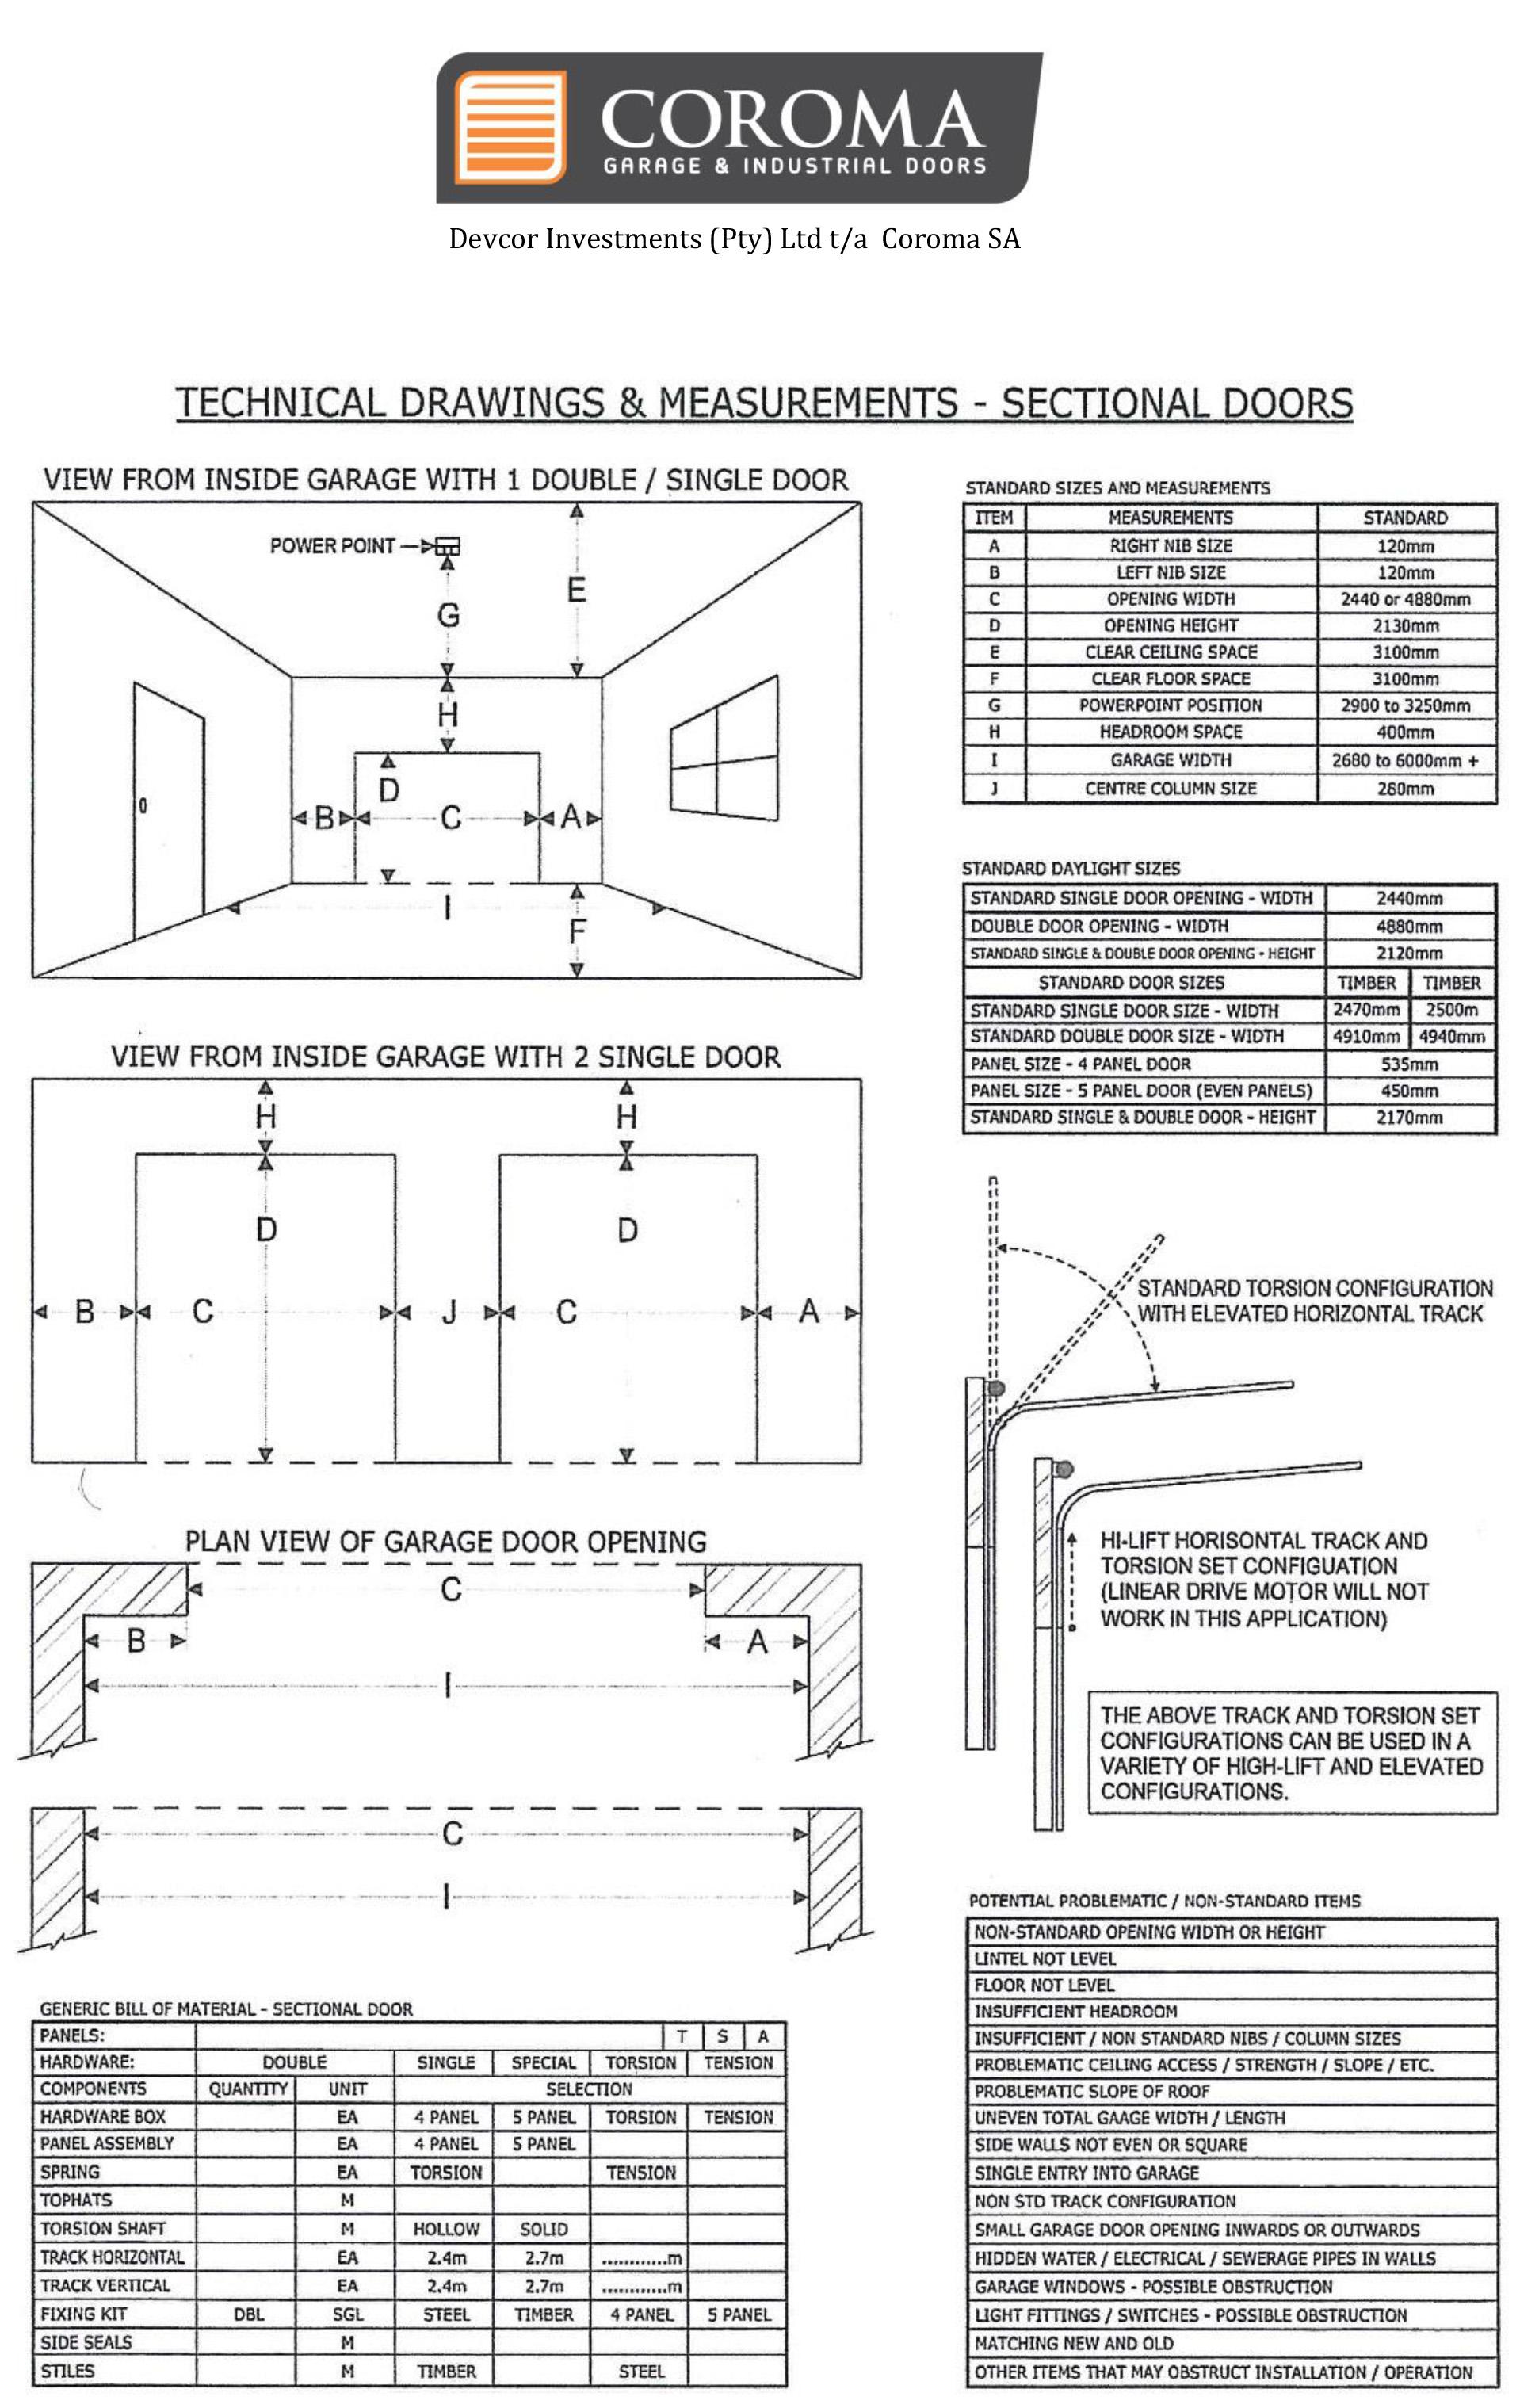 Caroma Doors Amp Technical Drawing U0026 Measurements